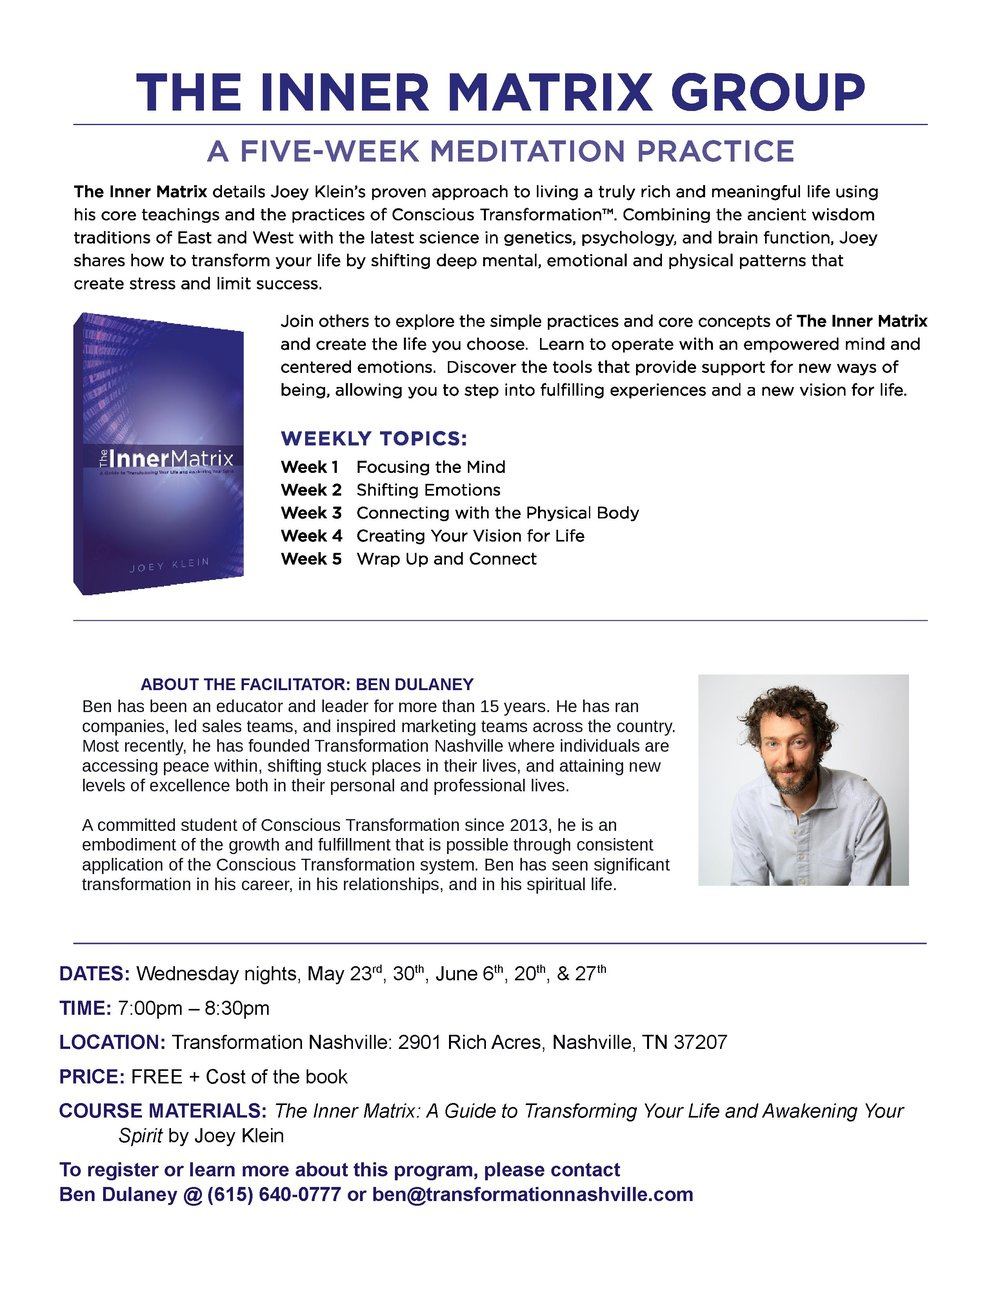 The Inner Matrix Book Group Flyer - Ben Dulaney.jpg